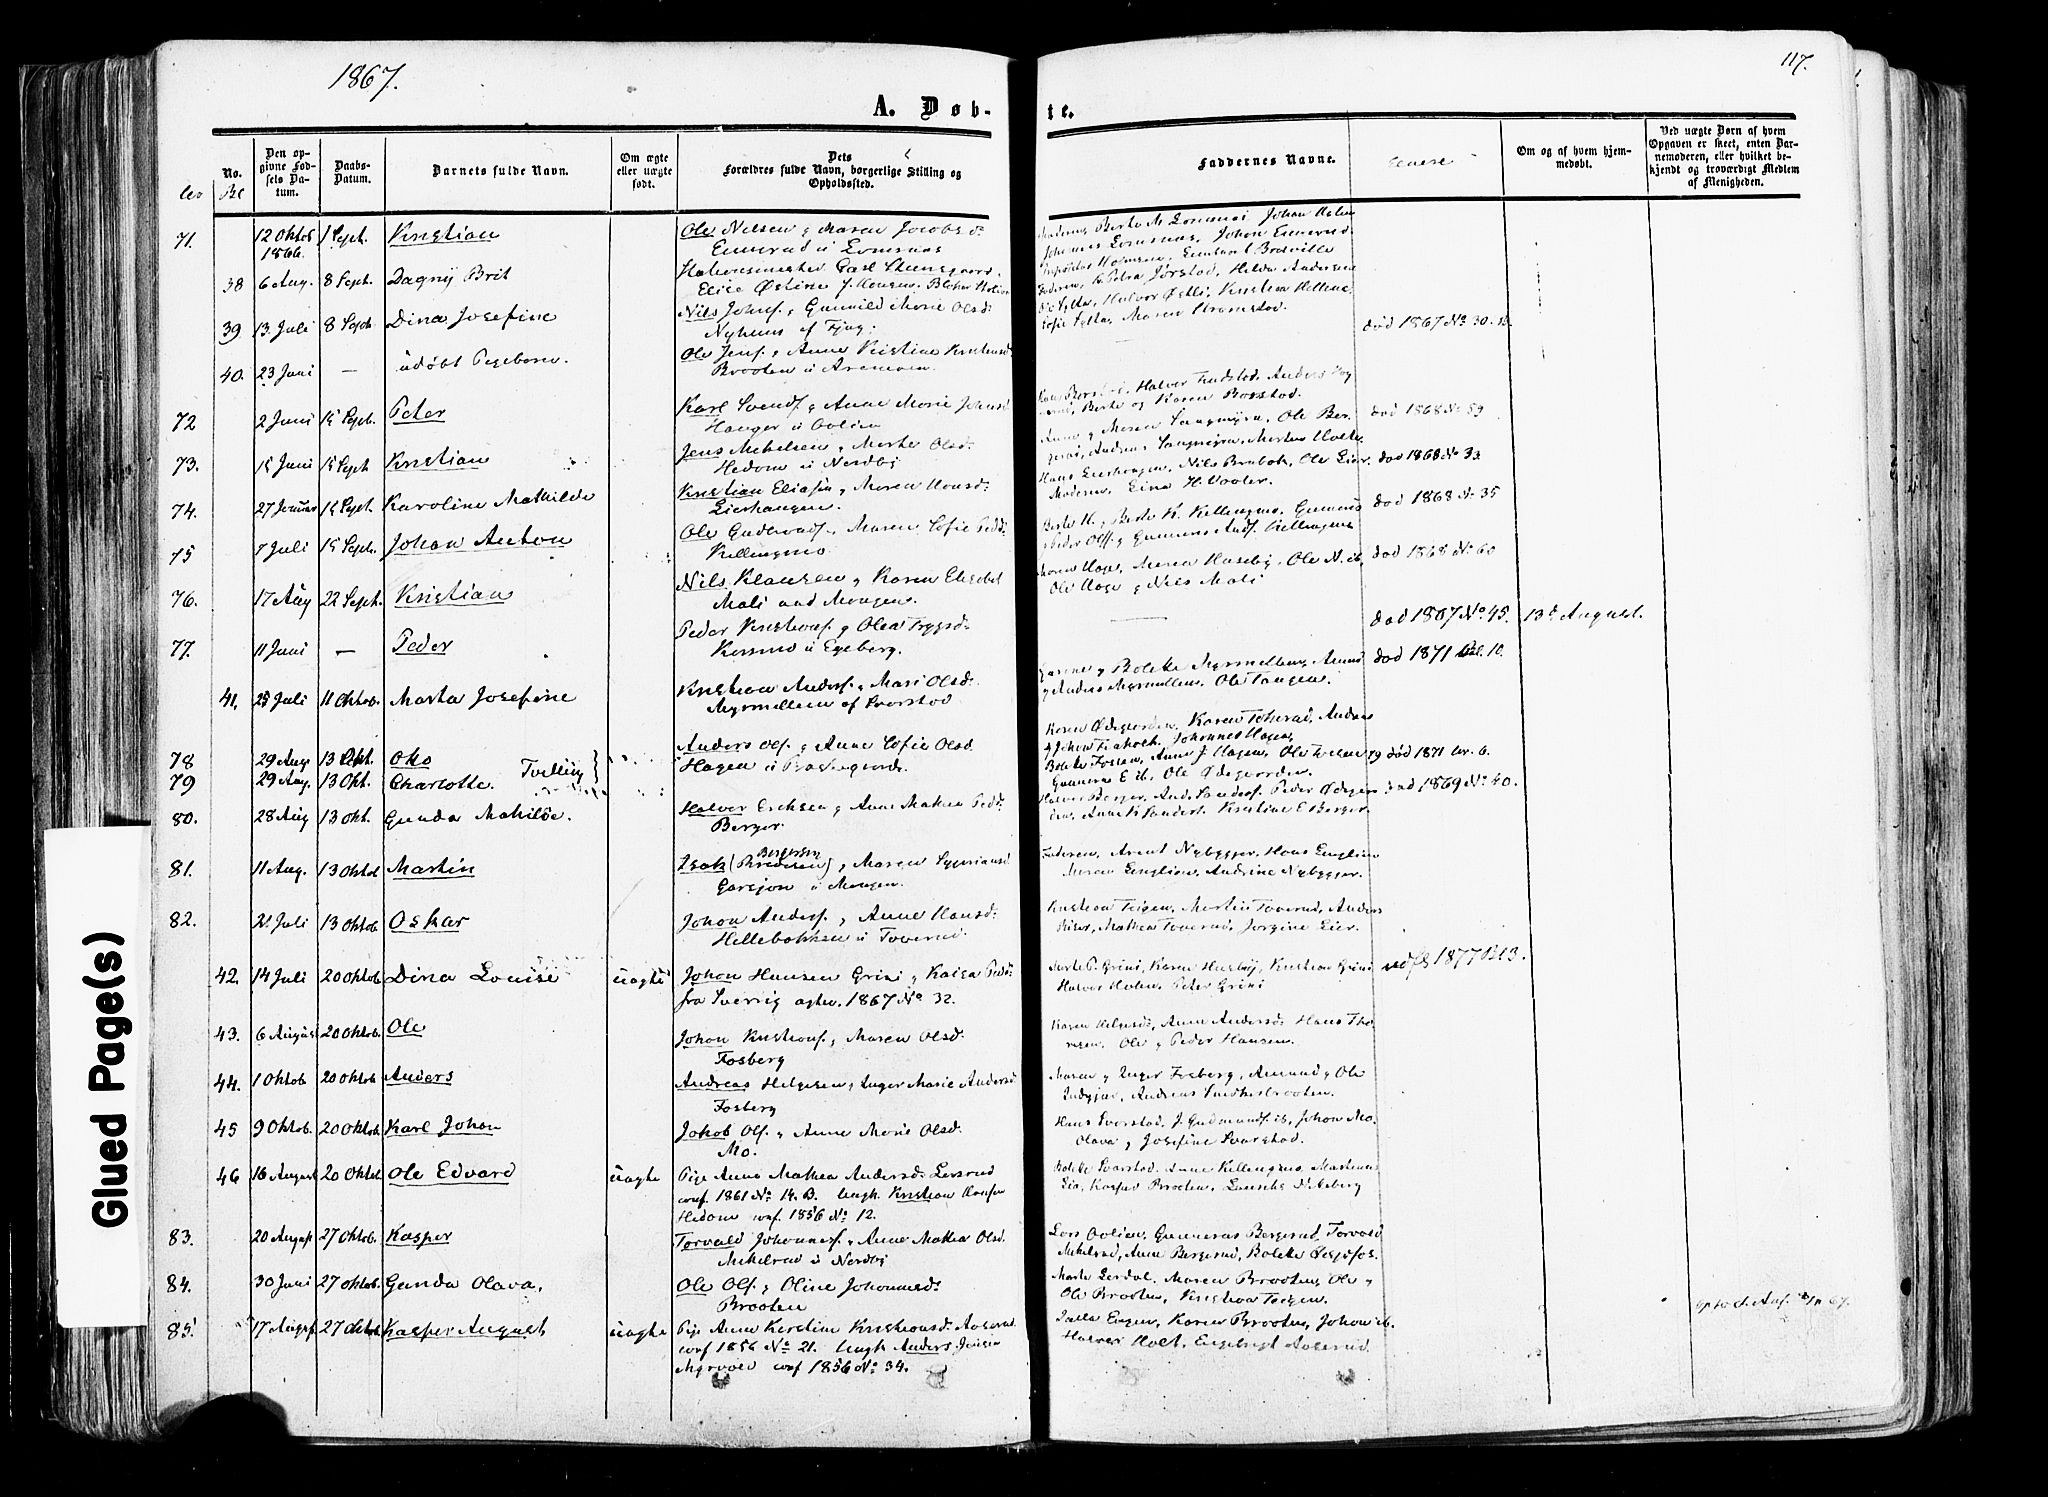 SAO, Aurskog prestekontor Kirkebøker, F/Fa/L0007: Ministerialbok nr. I 7, 1854-1877, s. 117